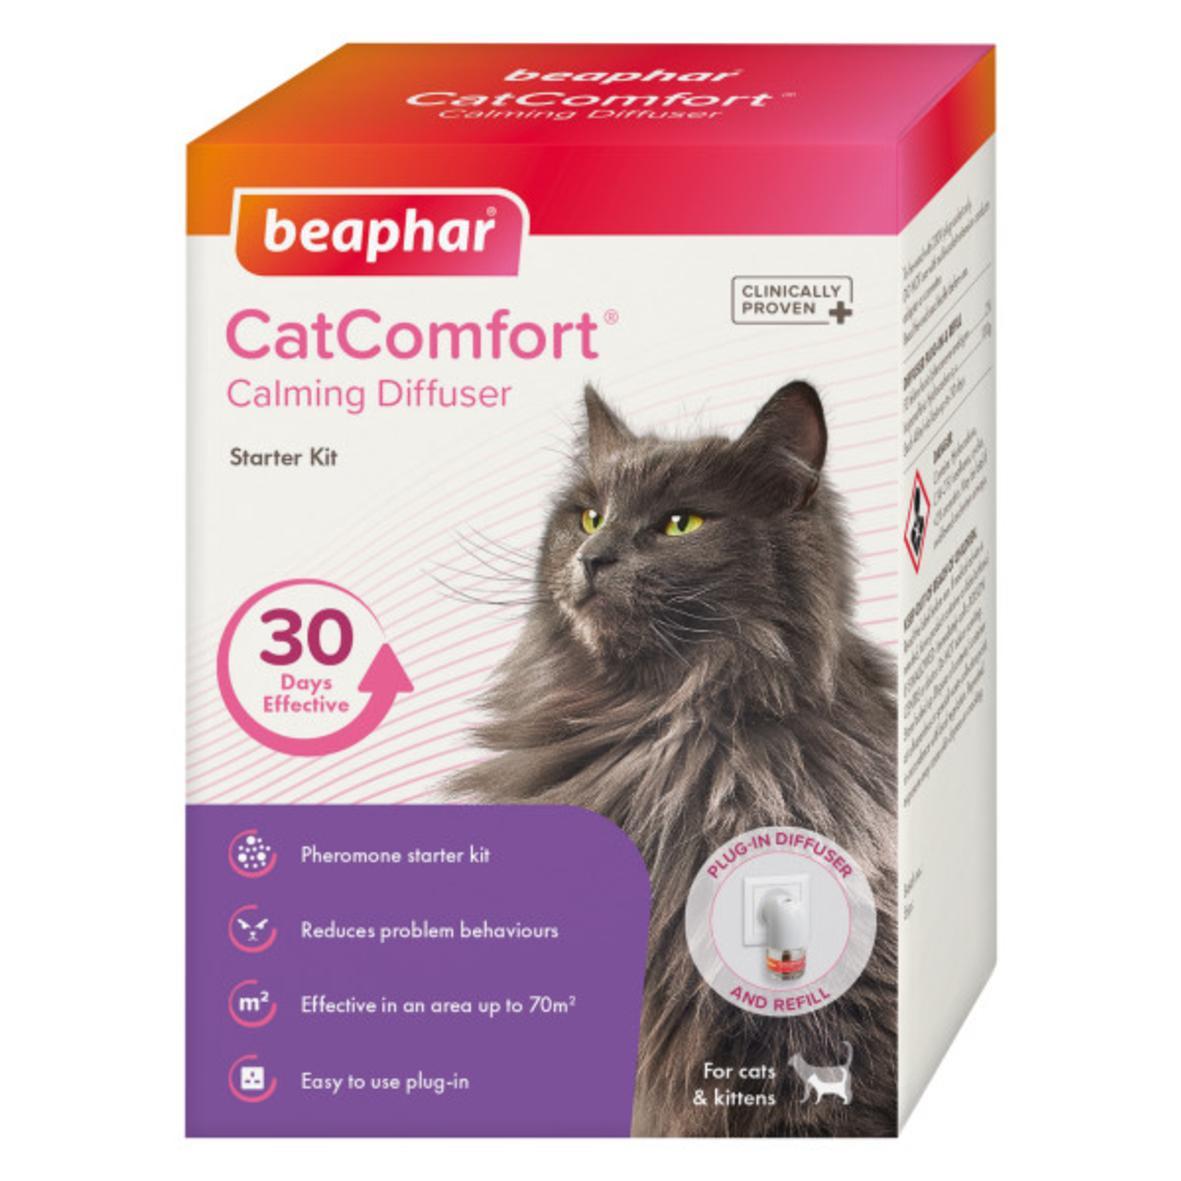 CLEARANCE BEAPHAR CatComfort Calming Diffuser 48ml